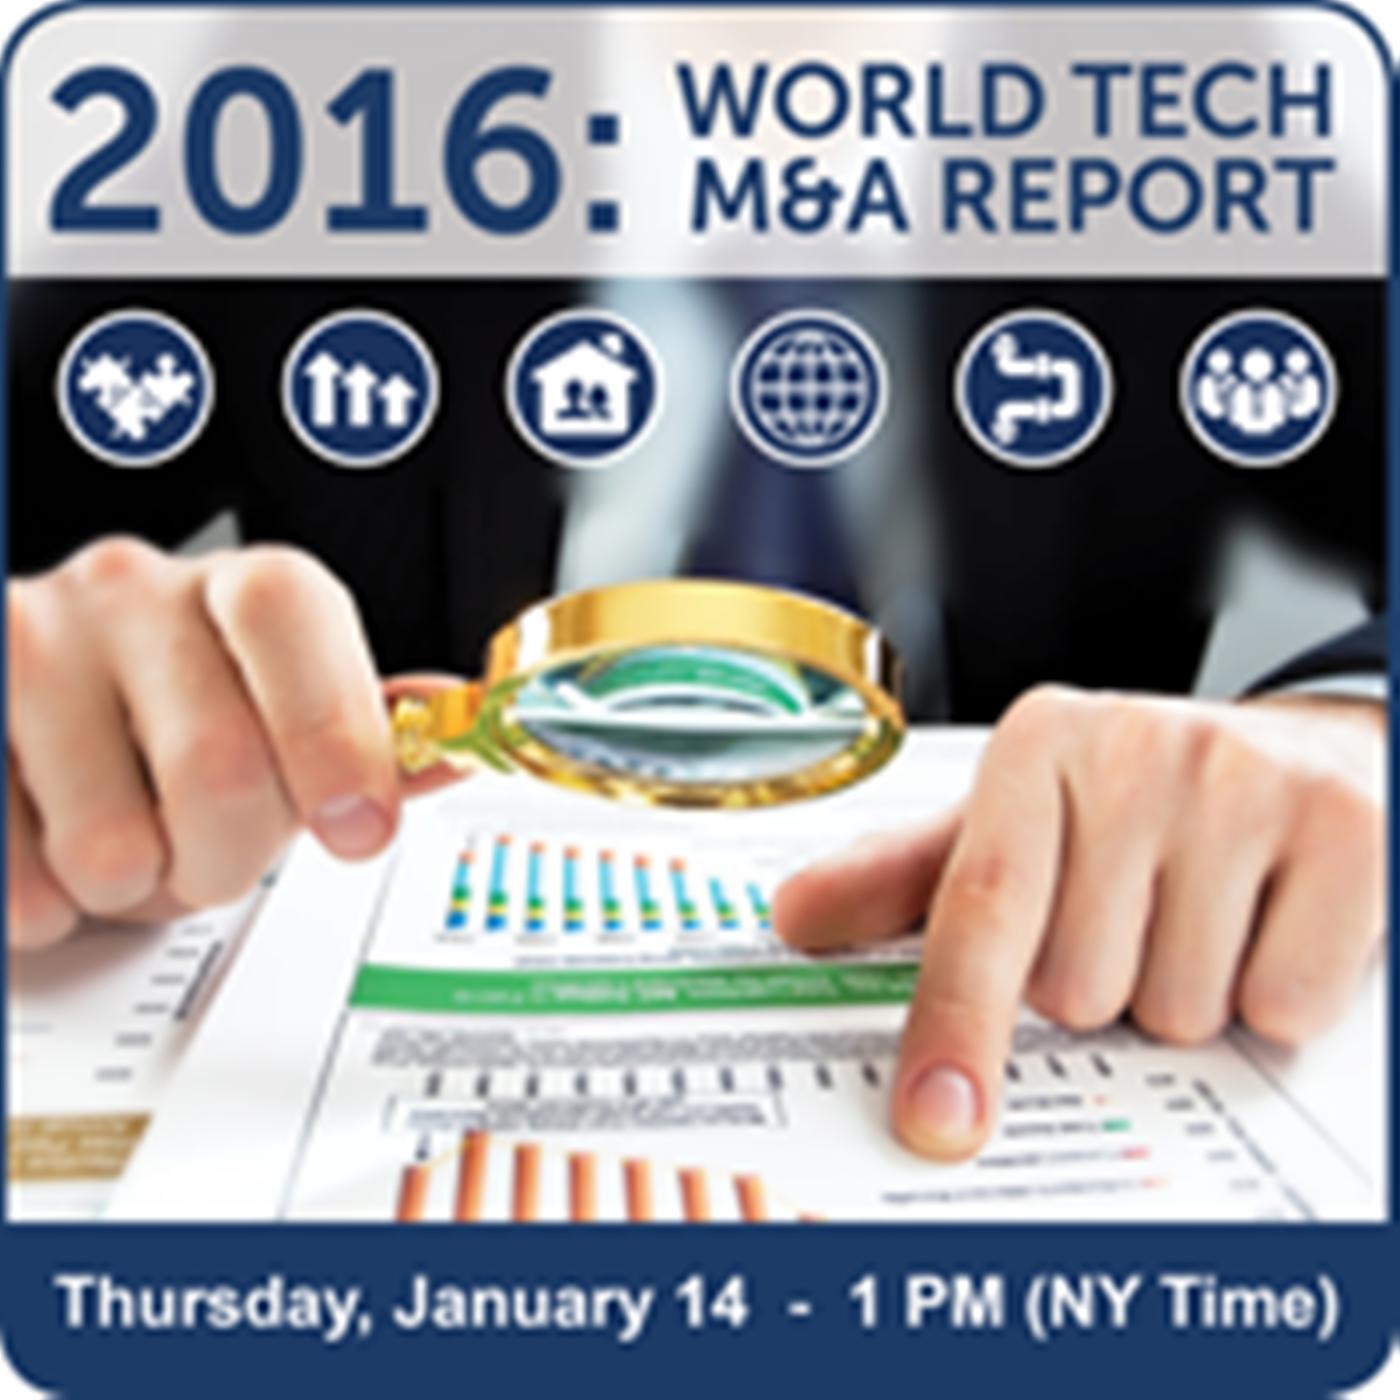 Tech M&A Annual Report: Top 10 Disruptive Tech Trends #9 & 10